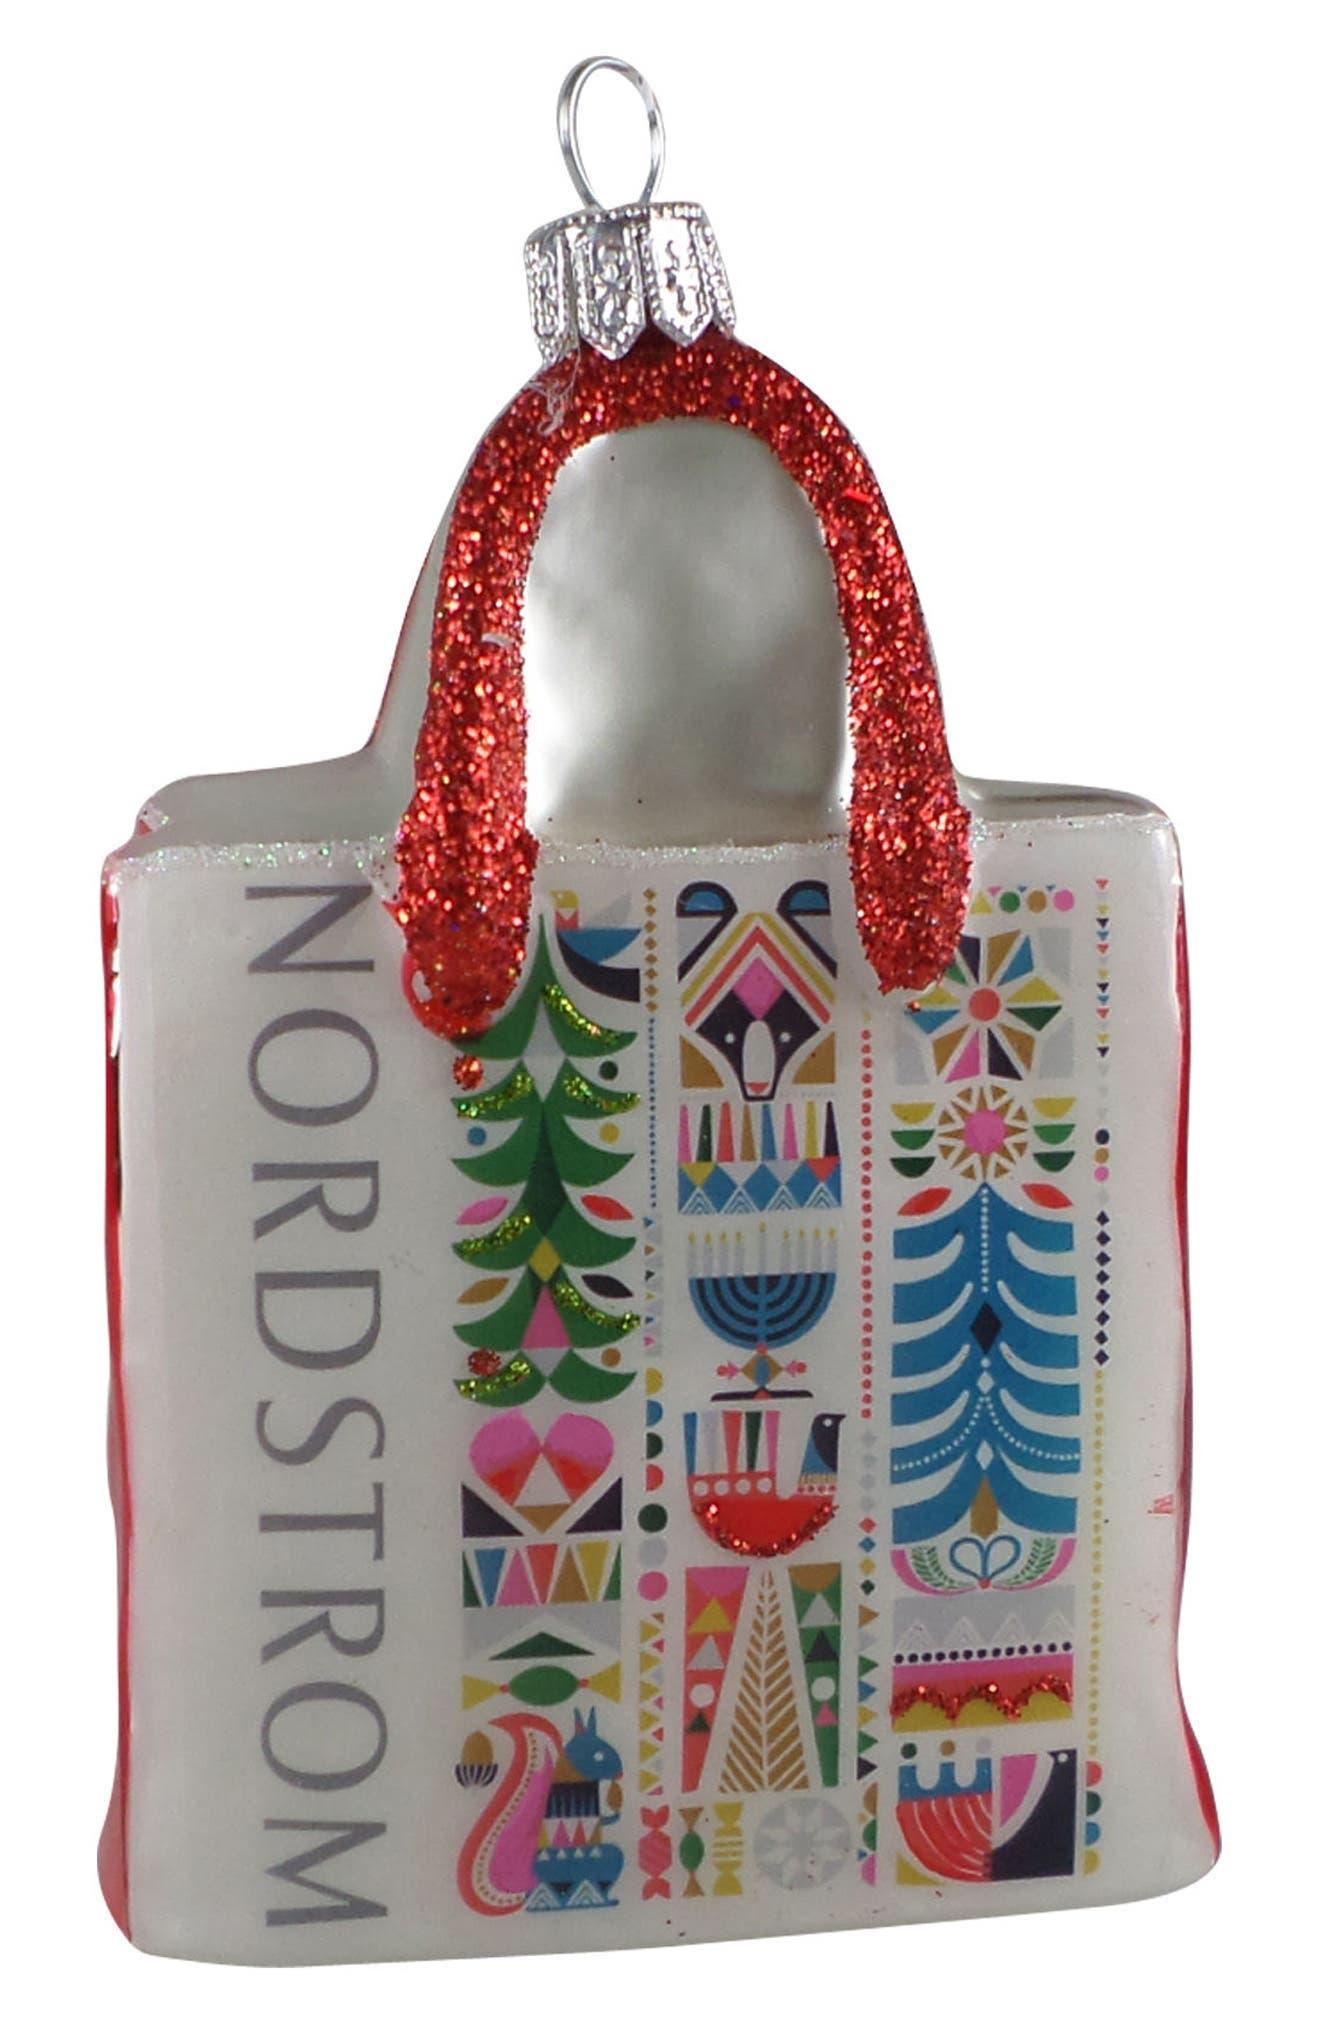 Alternate Image 1 Selected - Nordstrom at Home Nordstrom Shopping Bag 2017 Ornament